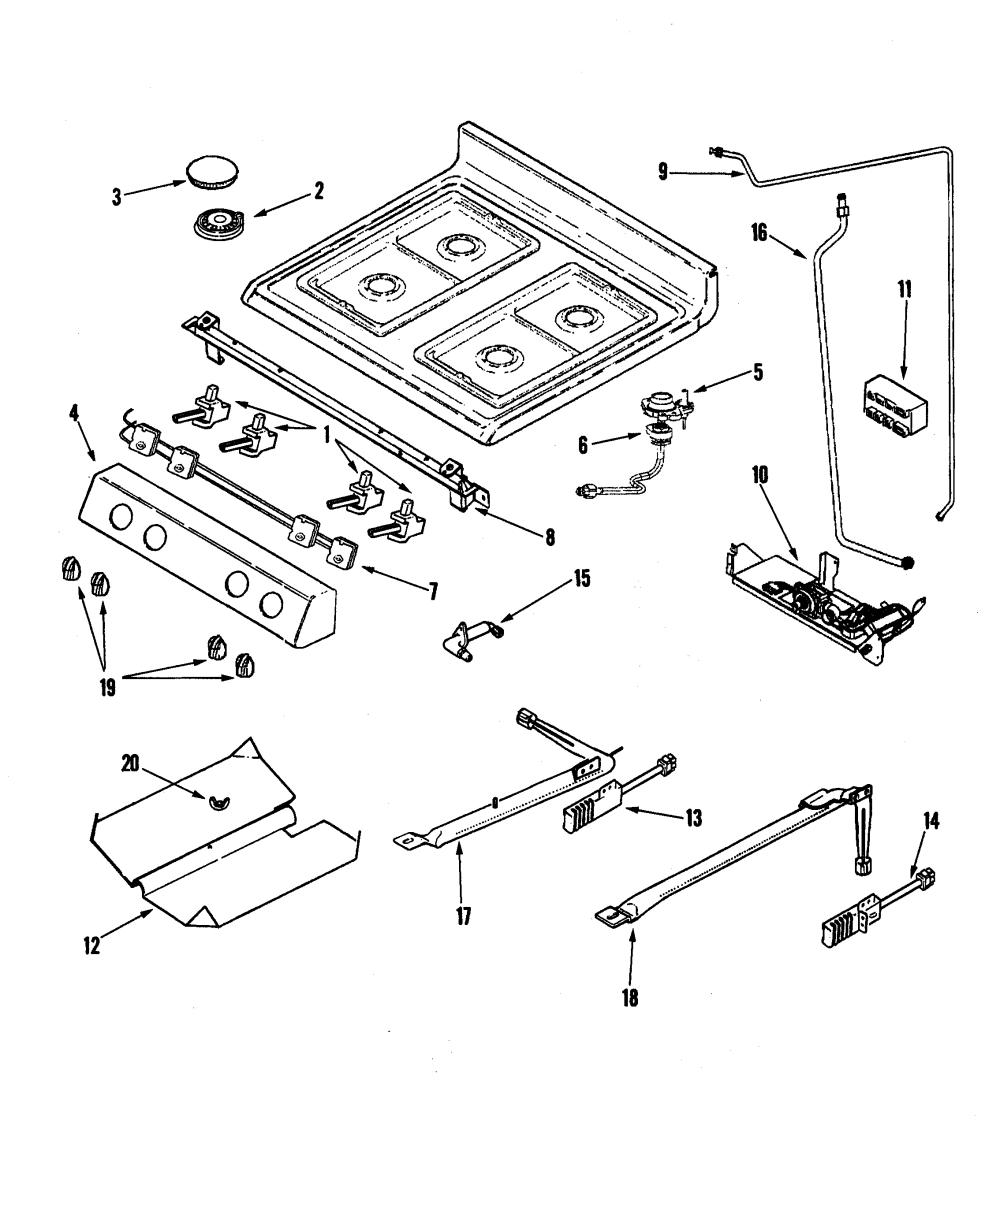 medium resolution of  wrg 9303 vintage gas stove wiring diagram